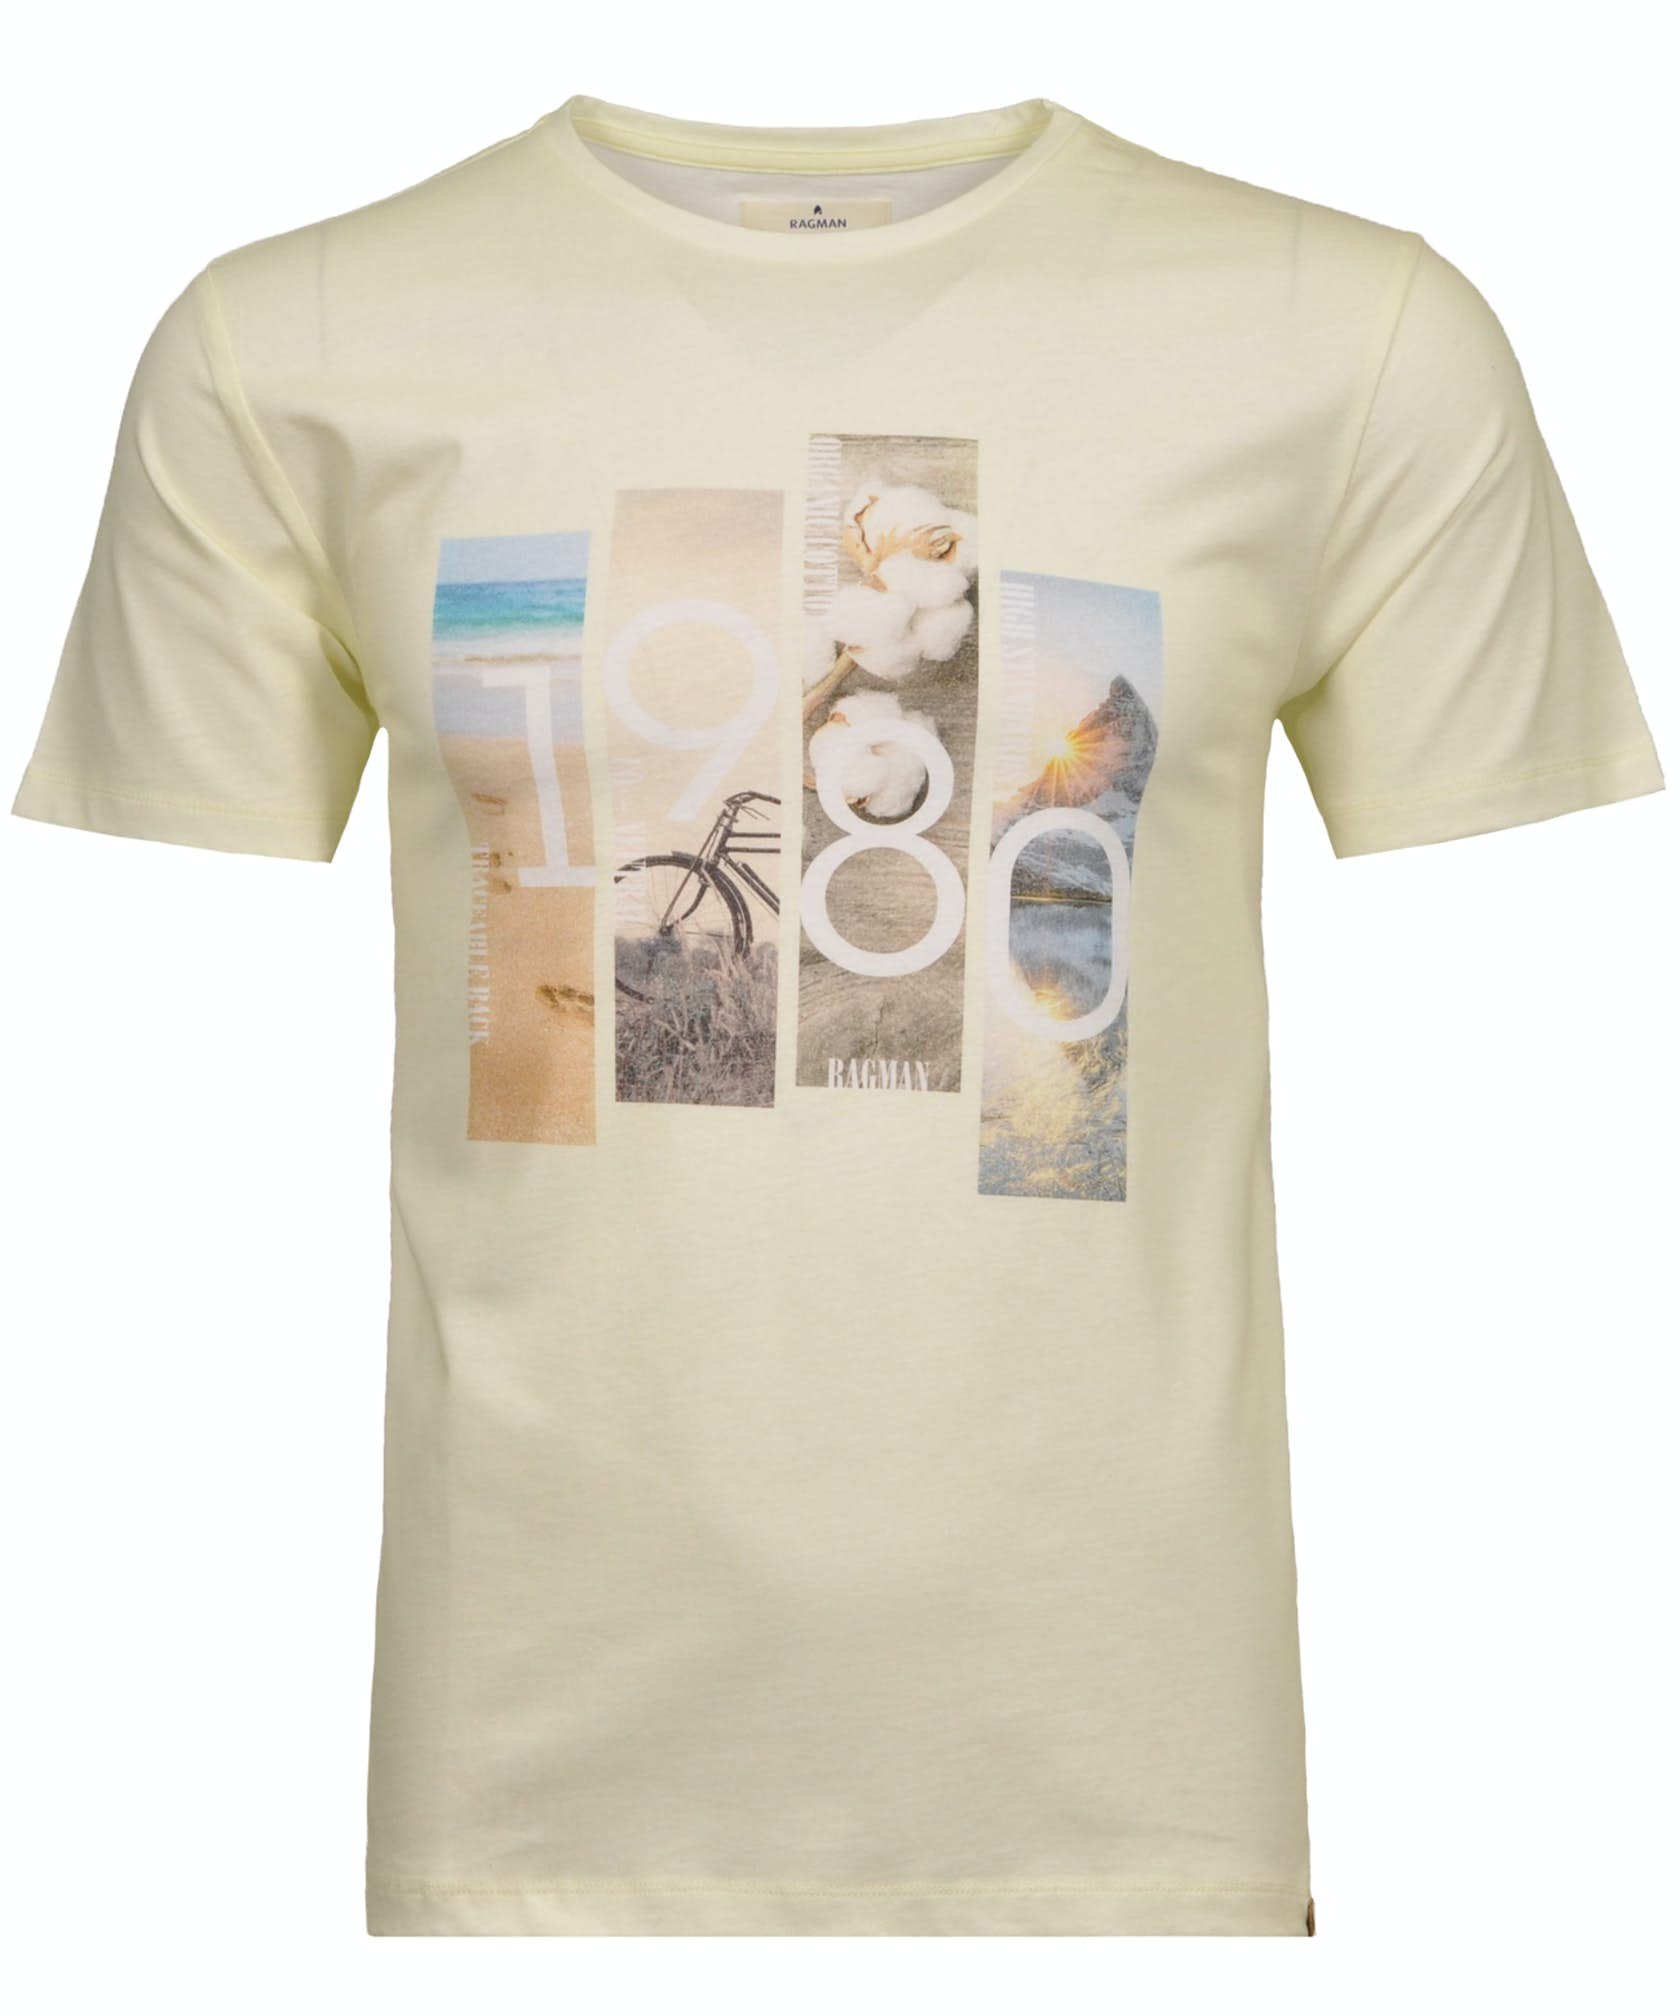 T-Shirt 1980 BioRe-Baumwolle